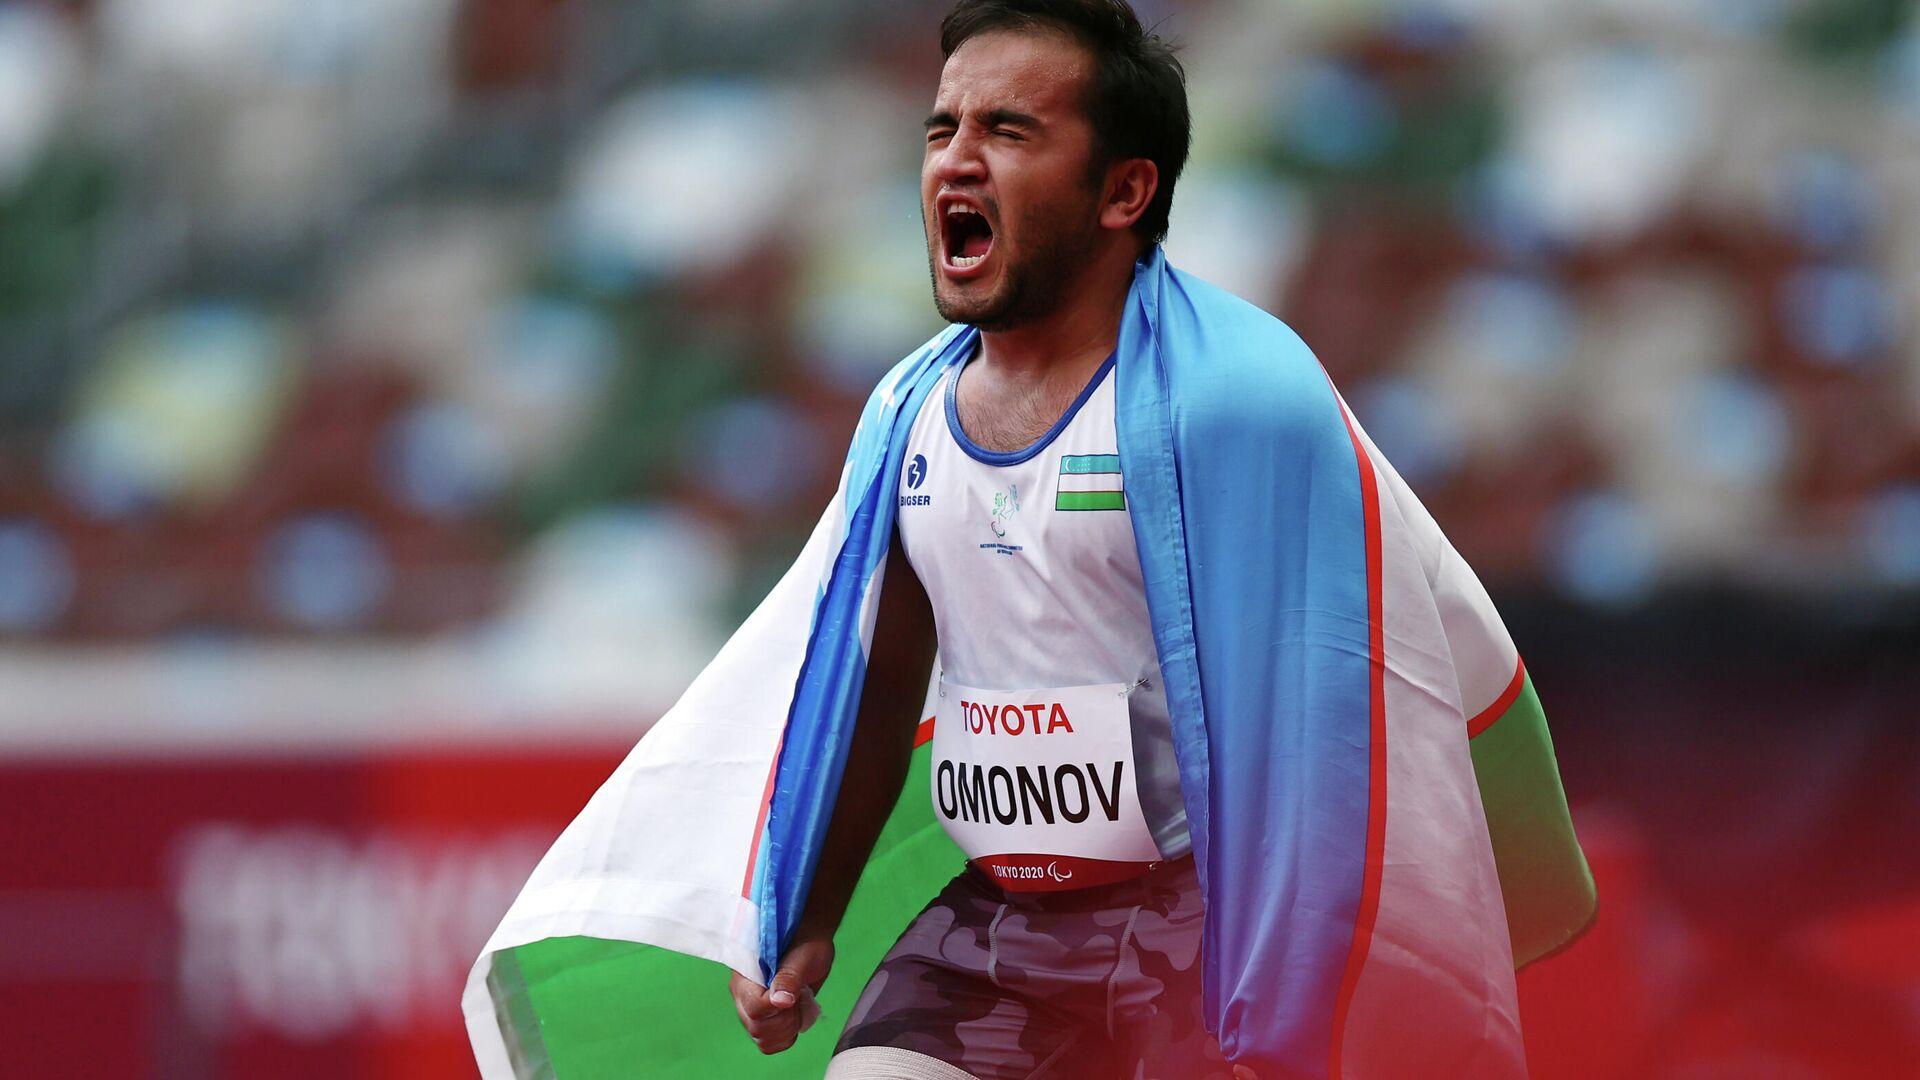 Bobirjon Omonov of Uzbekistan reacts after winning gold and setting a new Paralympic record with the flag of Uzbekistan REUTERS/Athit Perawongmetha - Sputnik Узбекистан, 1920, 05.09.2021